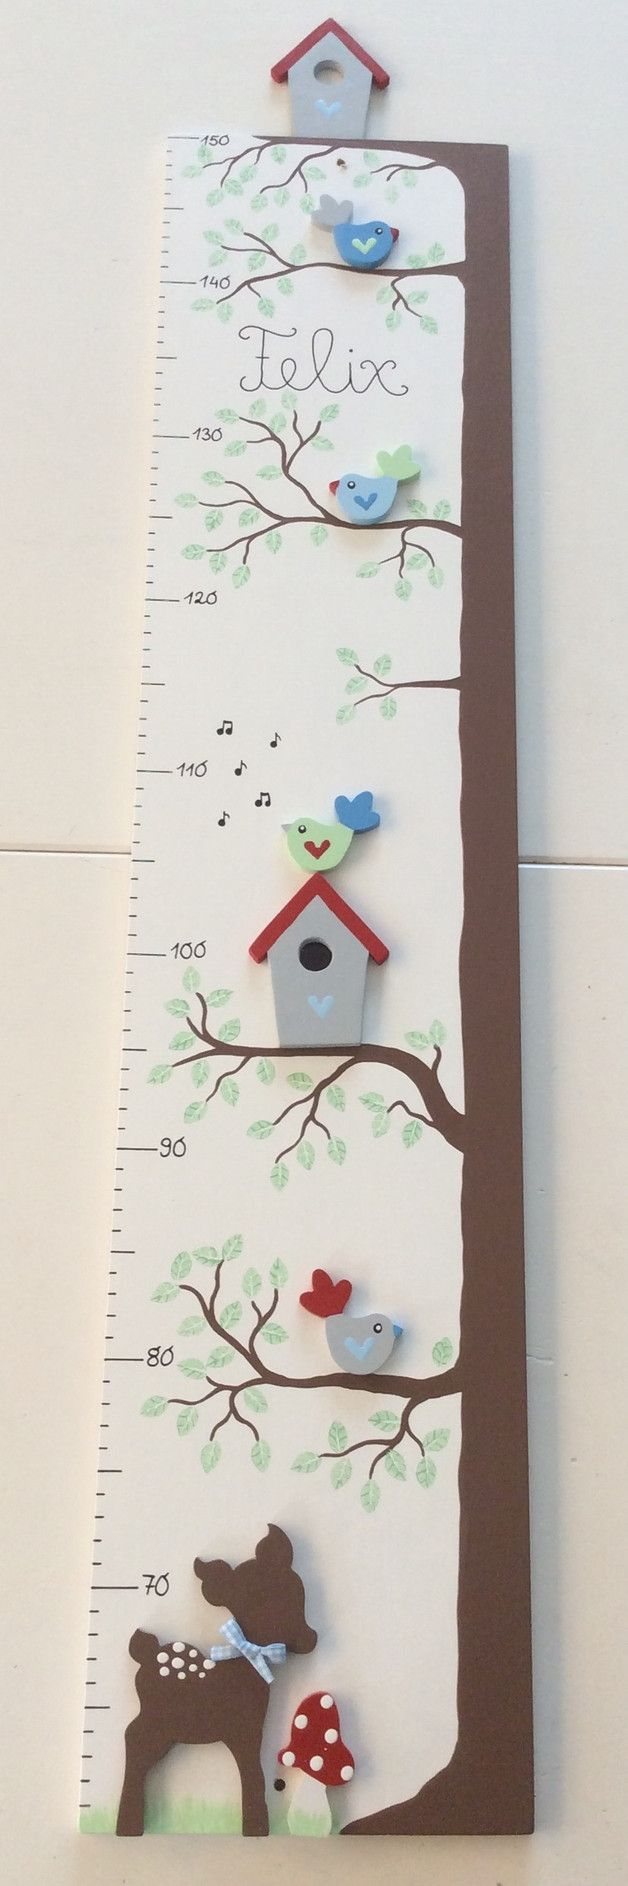 Raumaufkleber für mädchen  best great ideas images on pinterest  child room bedrooms and